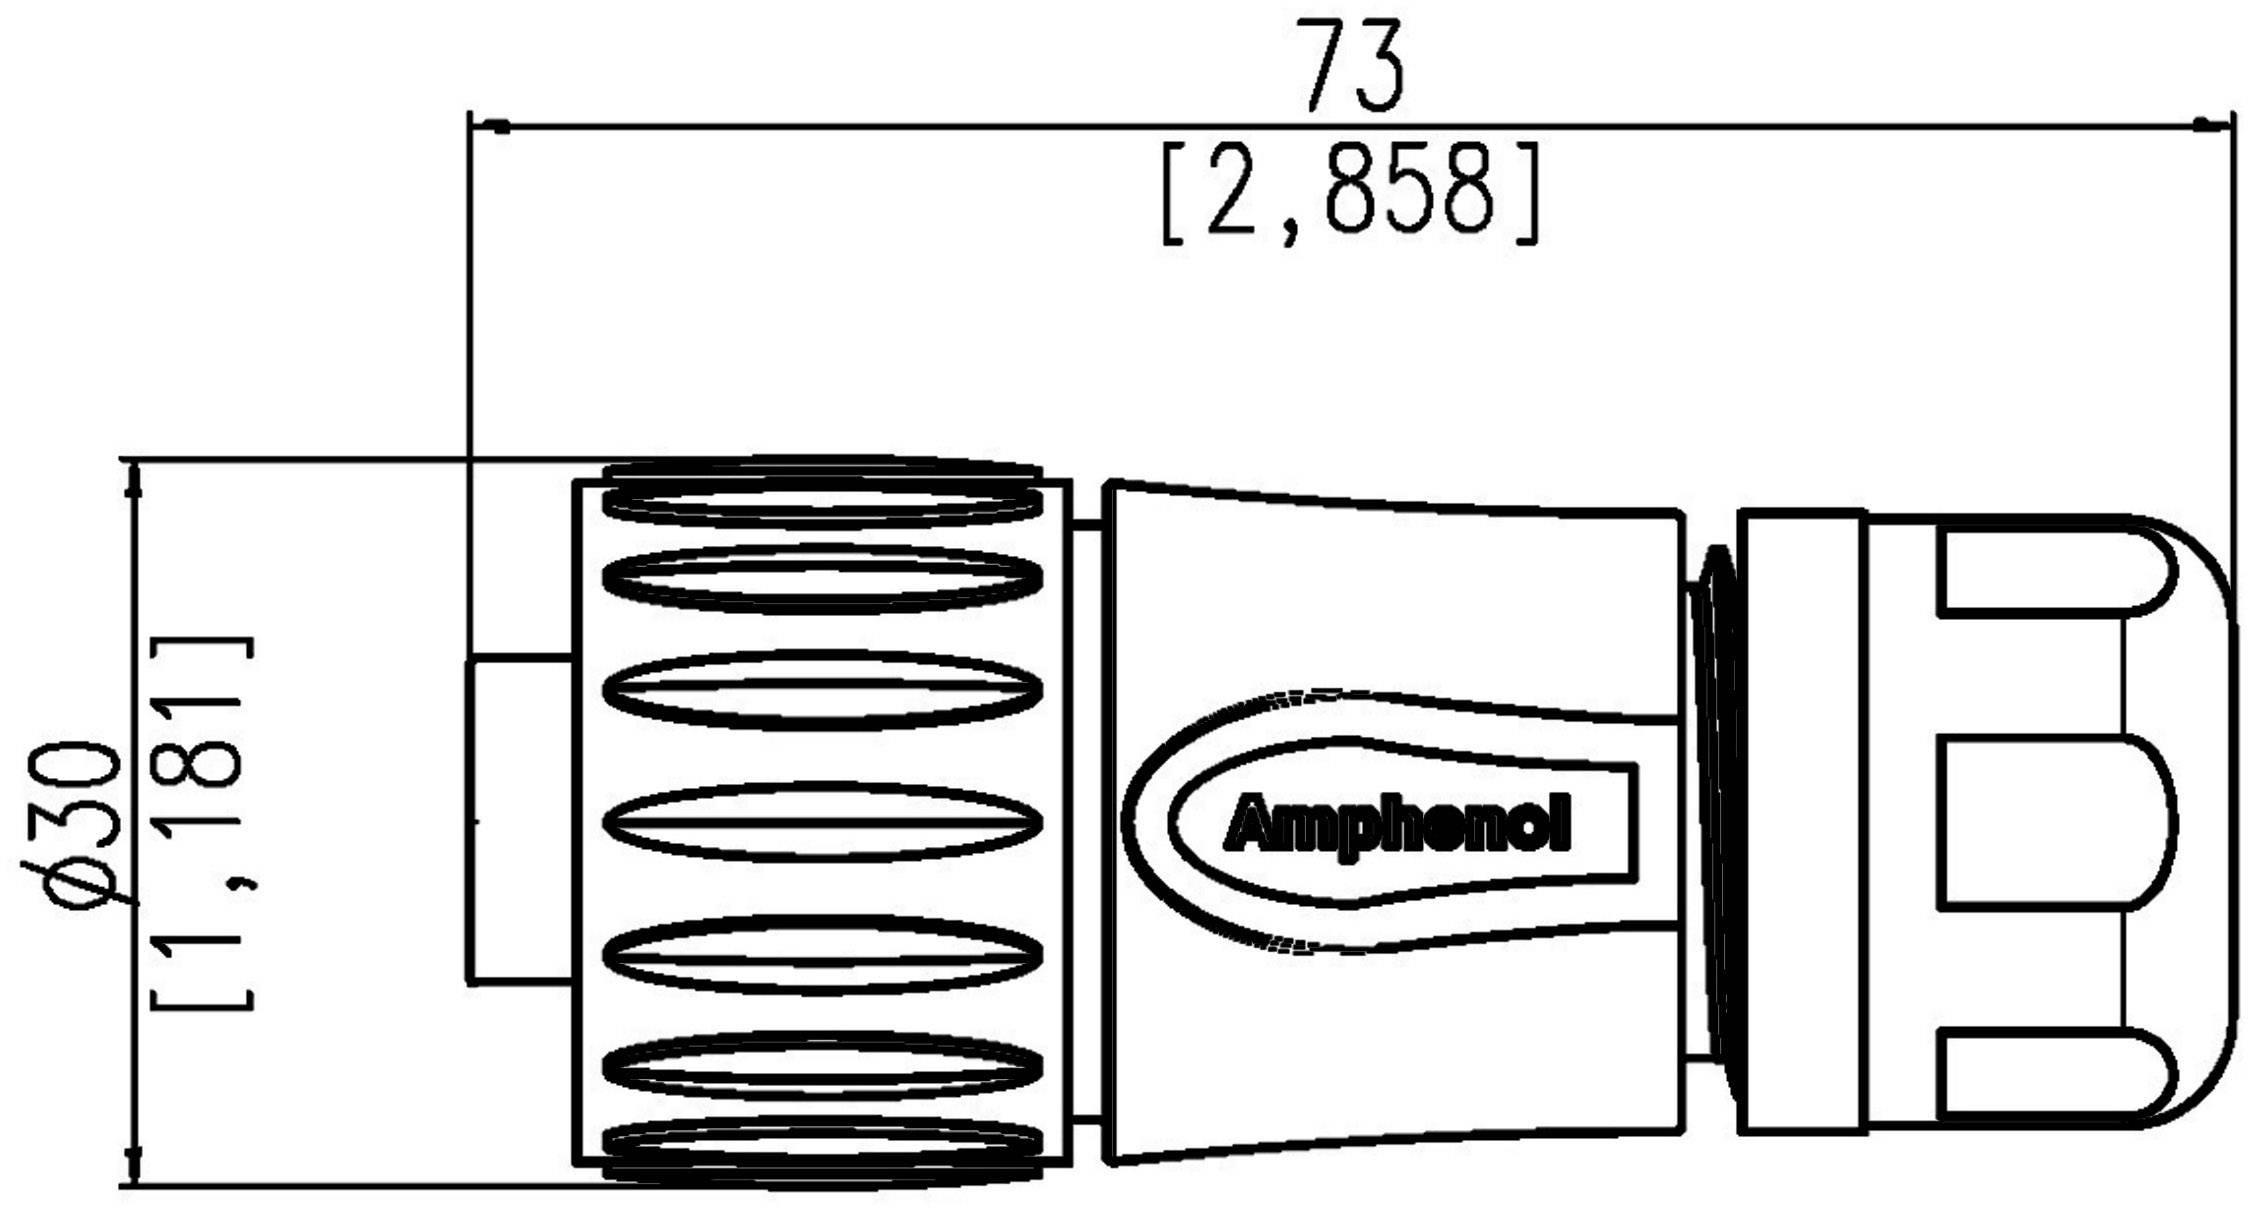 Kabelový konektor 6+PE Amphenol C016 10H006 010 12, černá